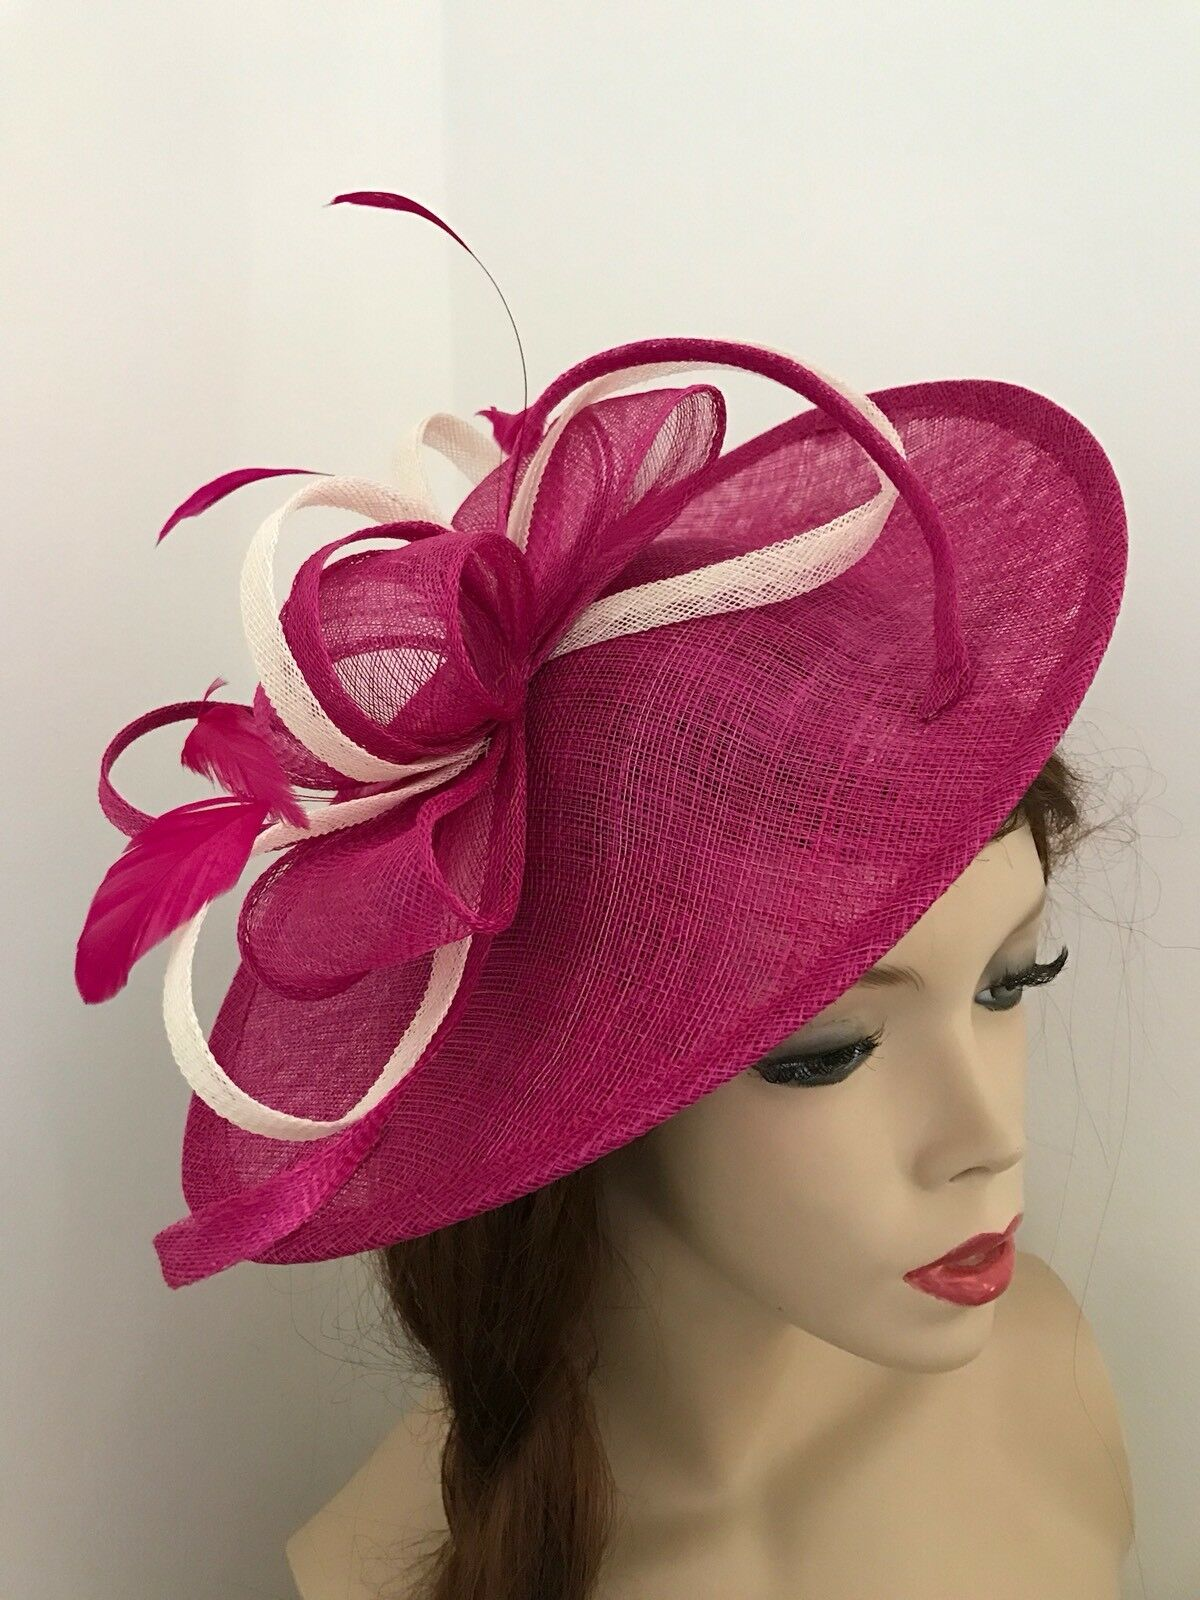 Fuchsia Pink Ivory Fascinator Saucer Hat Hatinator Races Disc Feathers Wedding